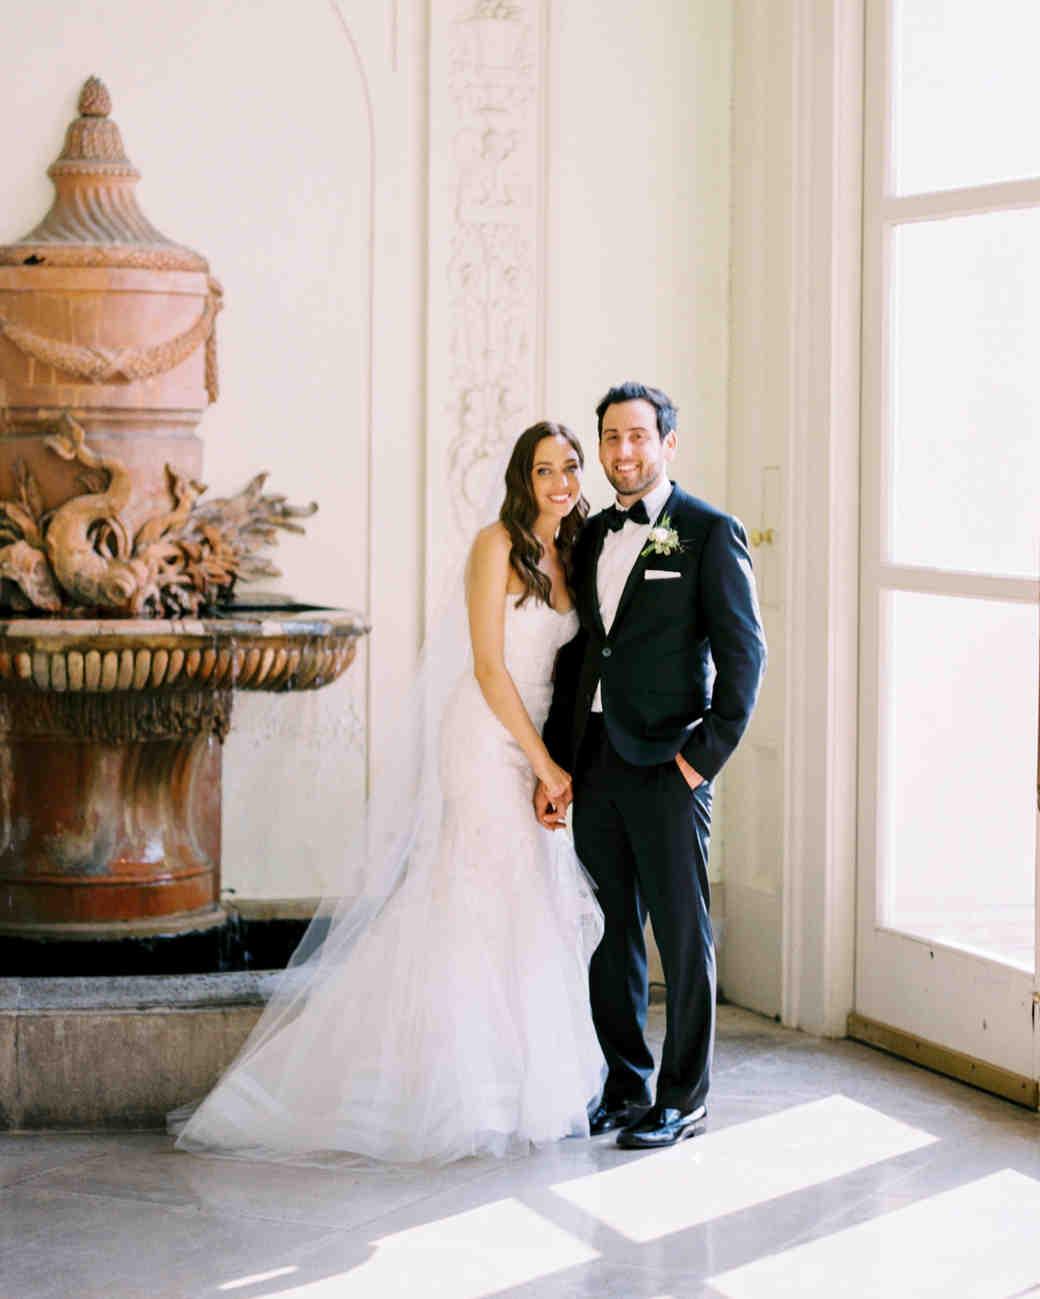 jackie-ross-wedding-couple-036-s111775-0215.jpg